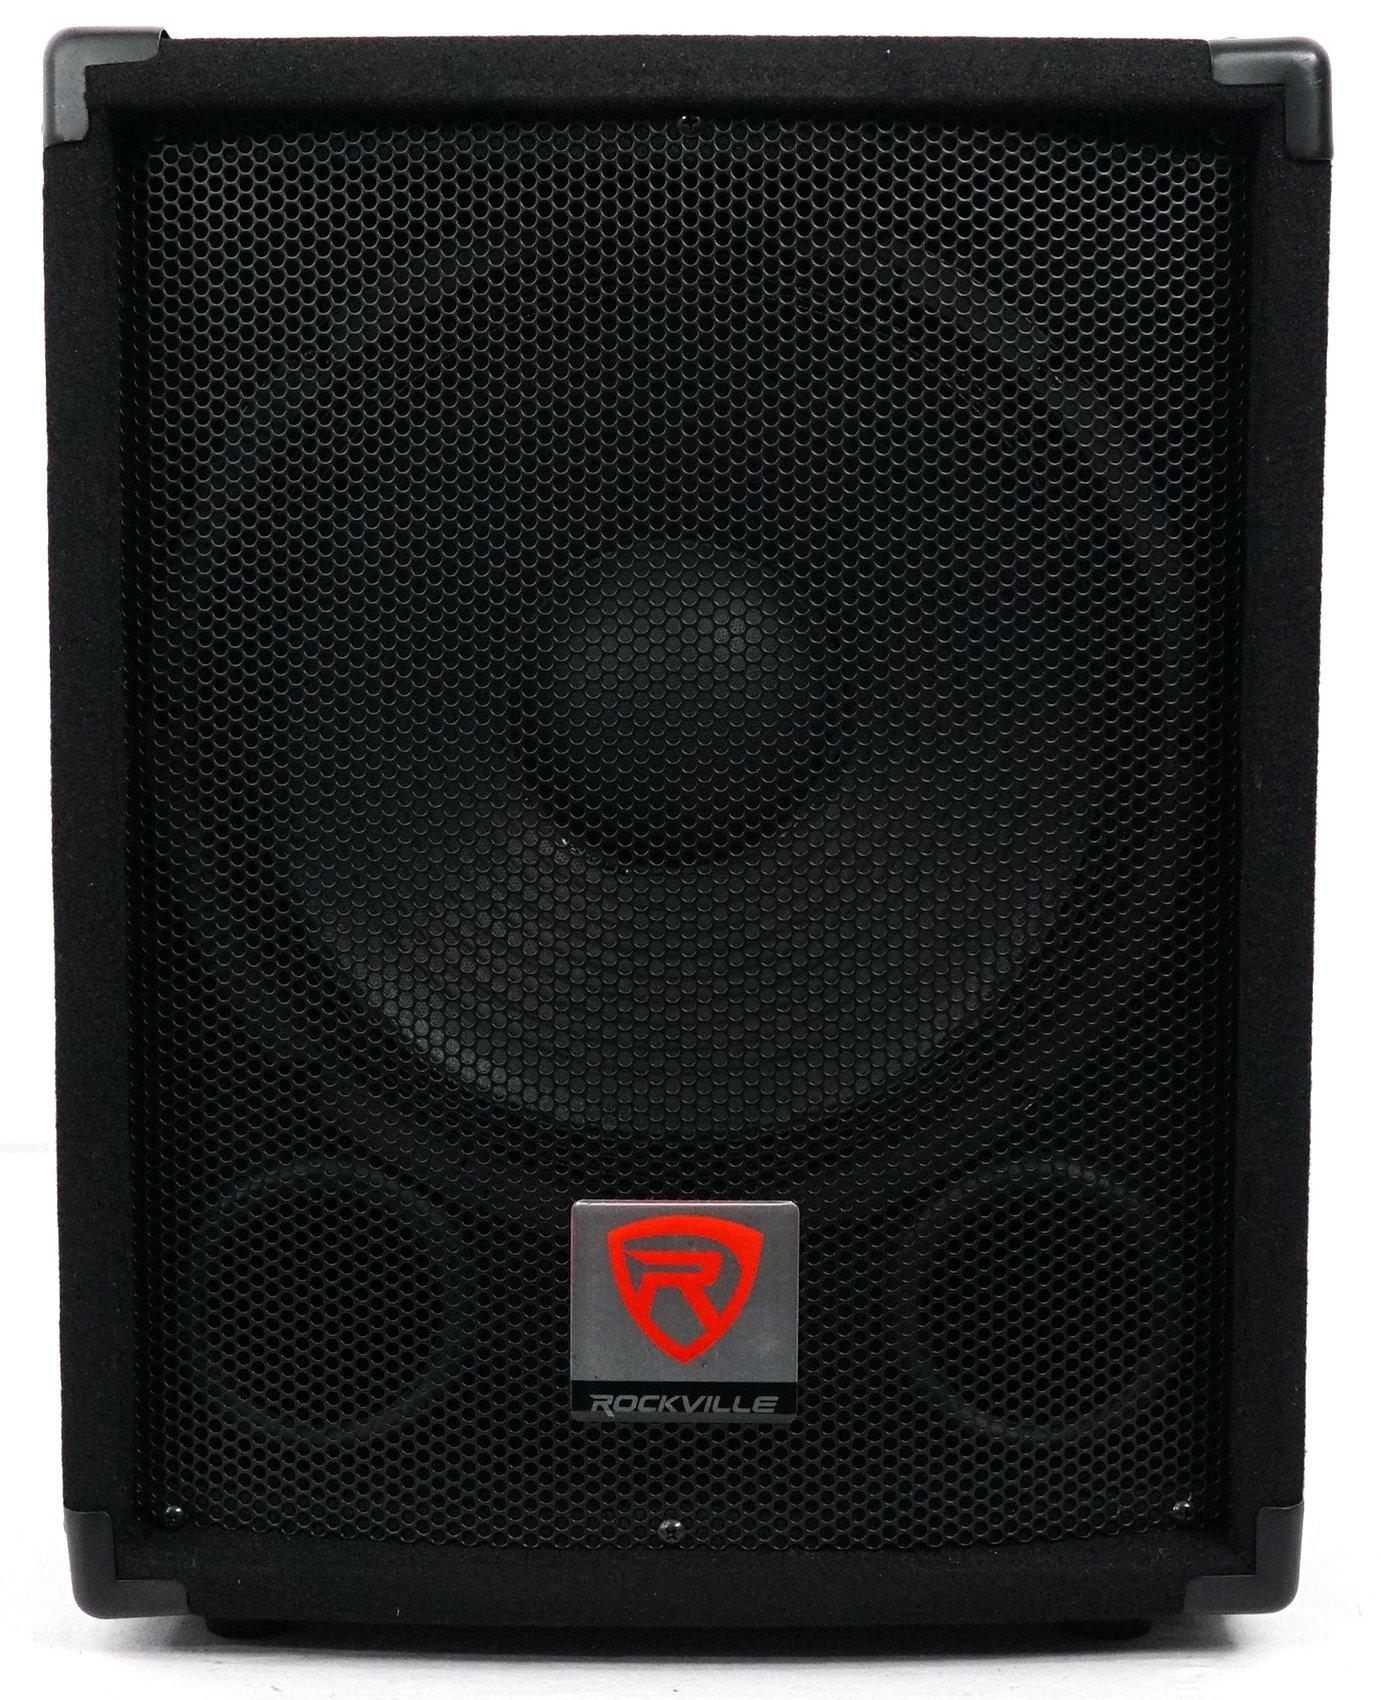 Rockville SBG1128 12'' 600 Watt Passive Pro DJ Subwoofer, MDF Cabinet/Pole Mount by Rockville (Image #1)